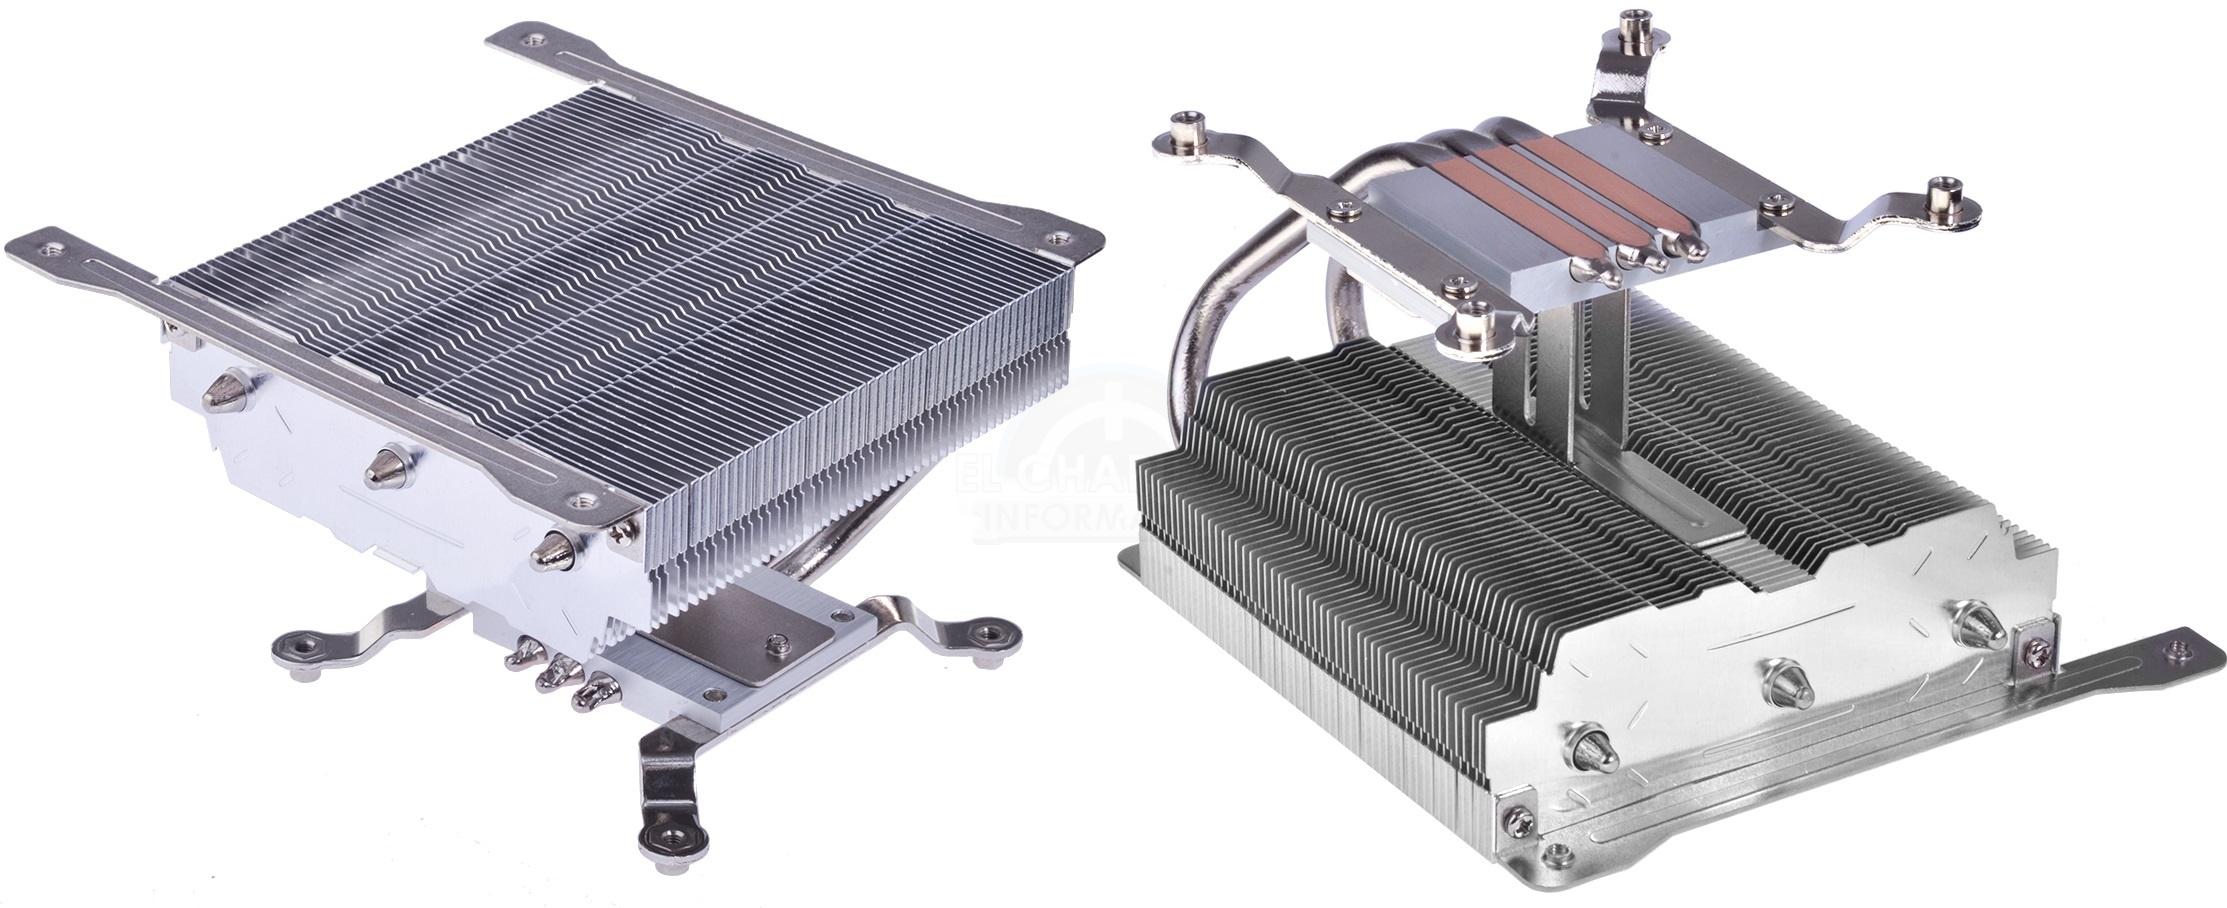 ID-Cooling IS-65: Disipador CPU para equipos compactos